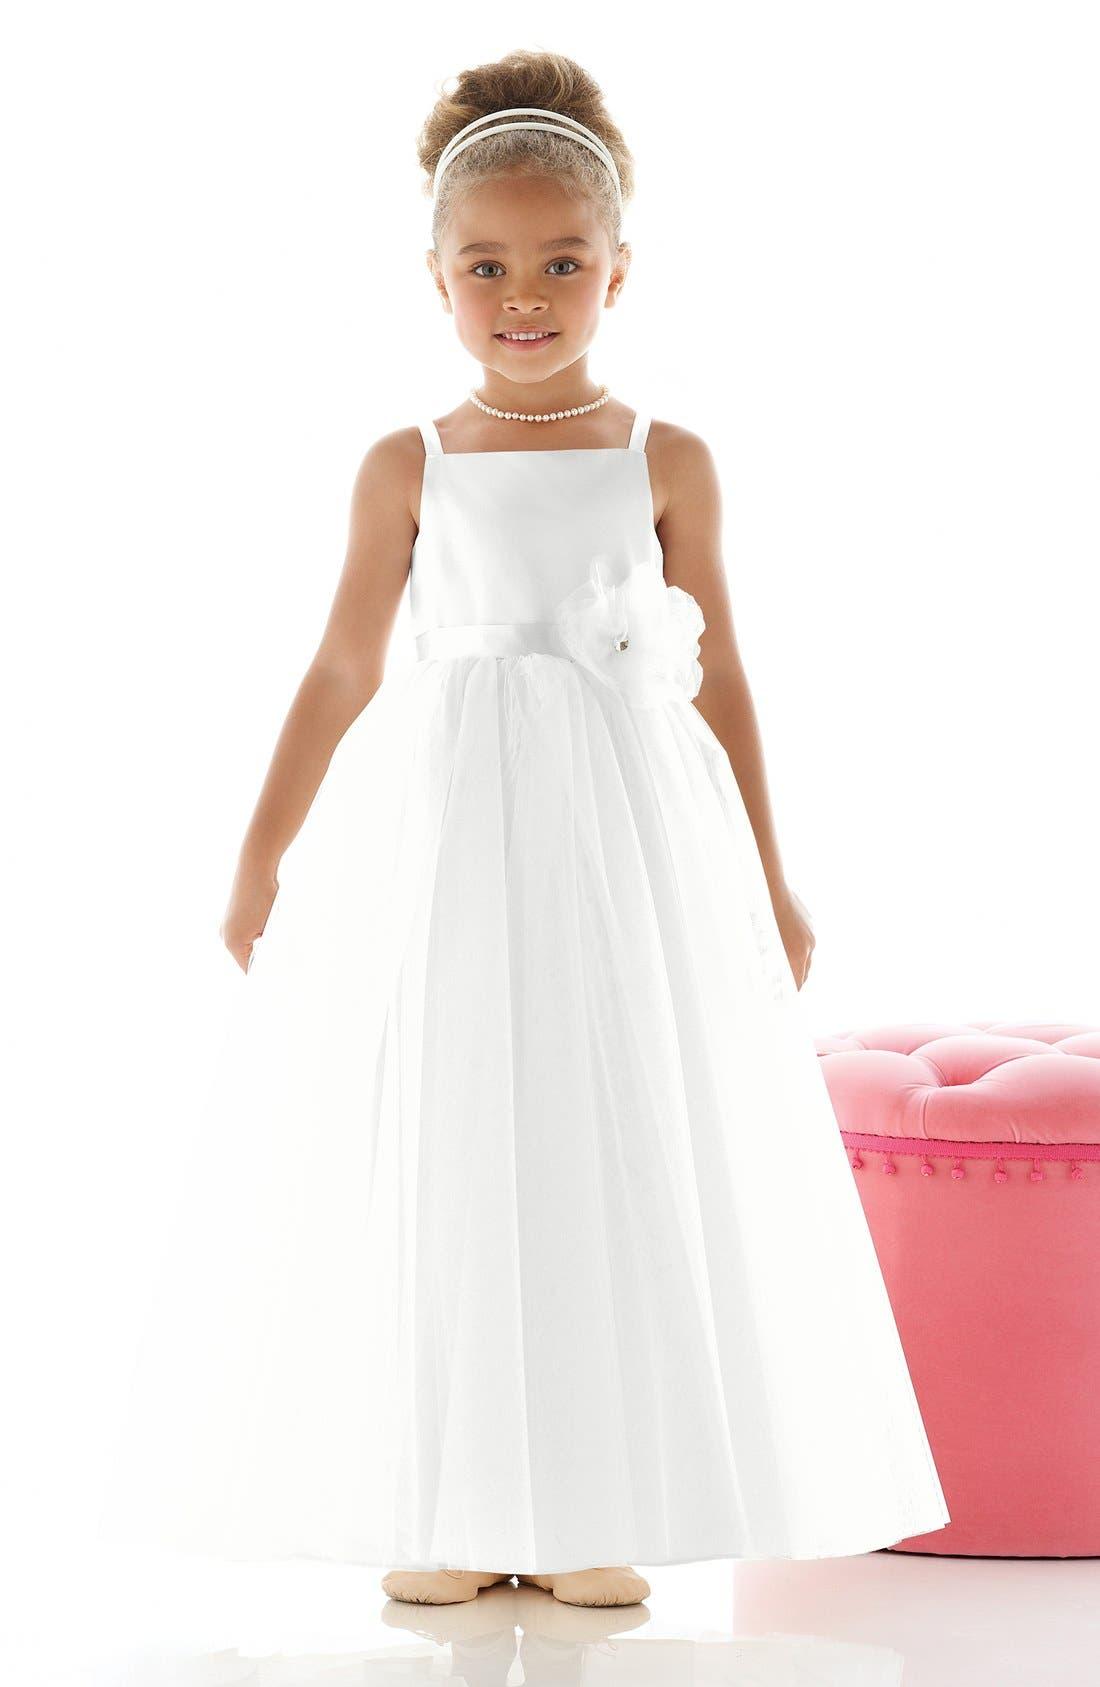 Alternate Image 1 Selected - Dessy Collection 'Rose' Satin & Tulle Flower Girl Dress (Toddler, Little Girls & Big Girls)